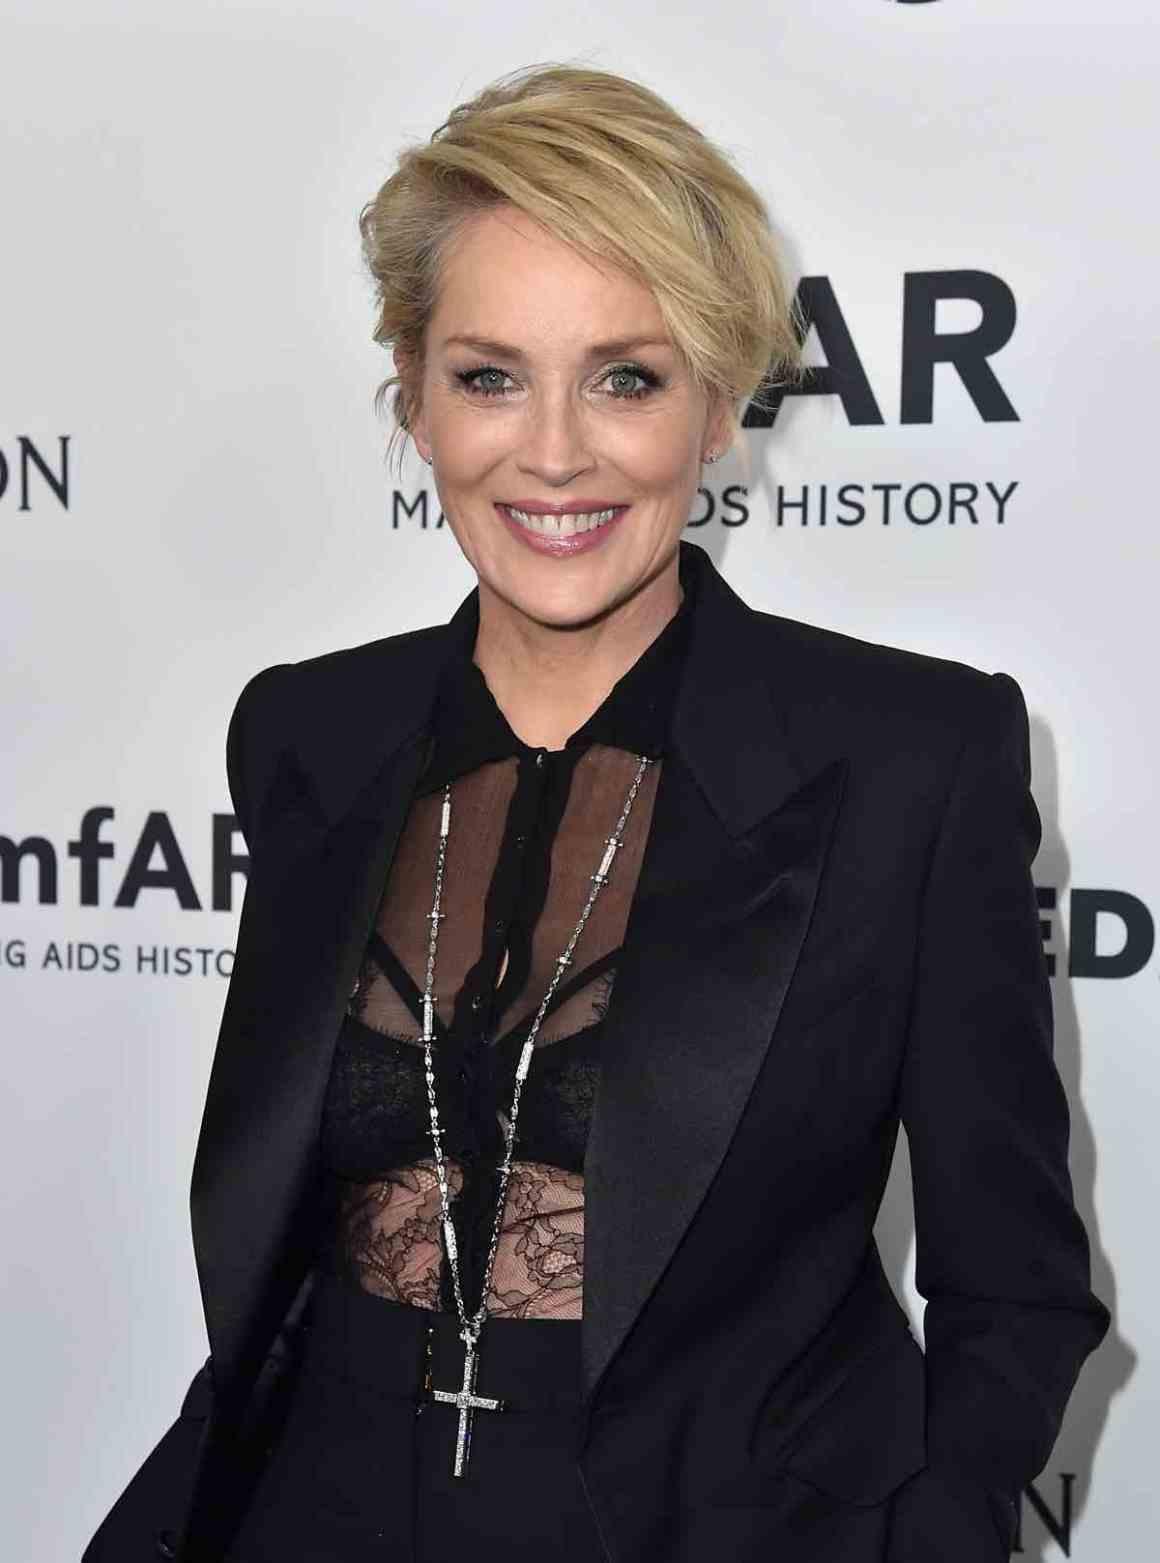 Sharon Stone amfAR's Inspiration Gala Los Angeles - Arrivals